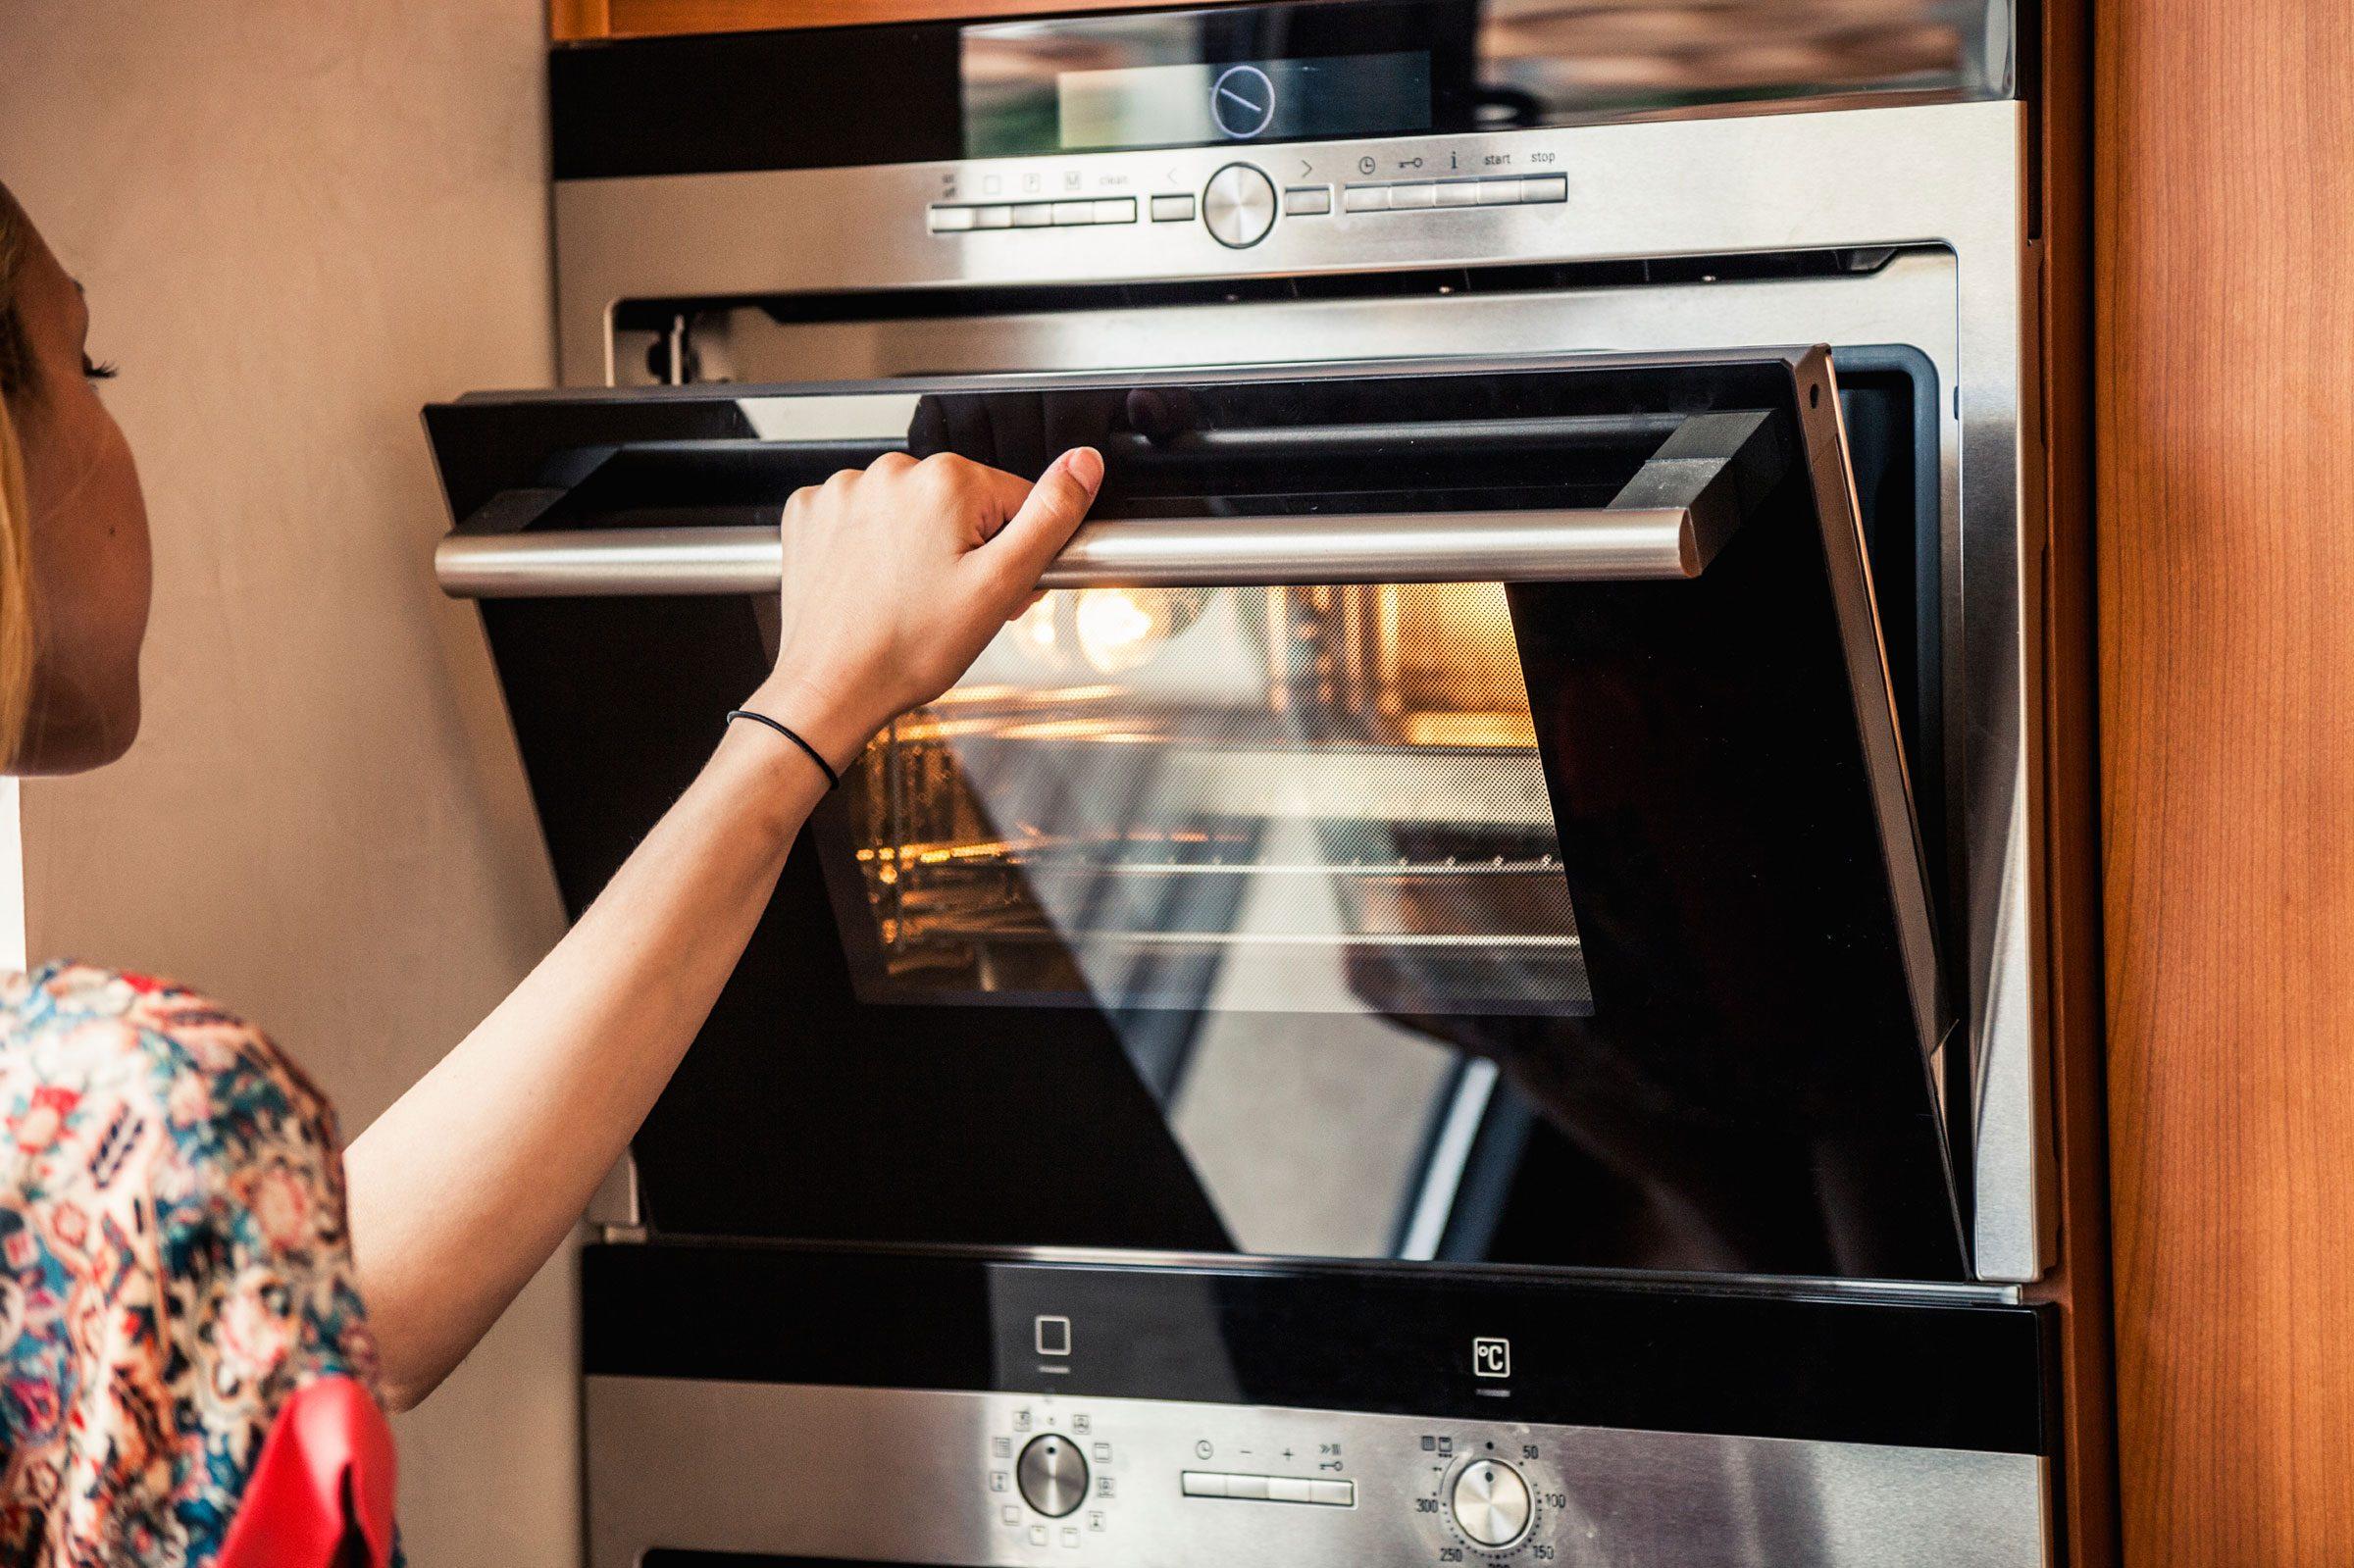 10. Never open the door when baking a souffle.